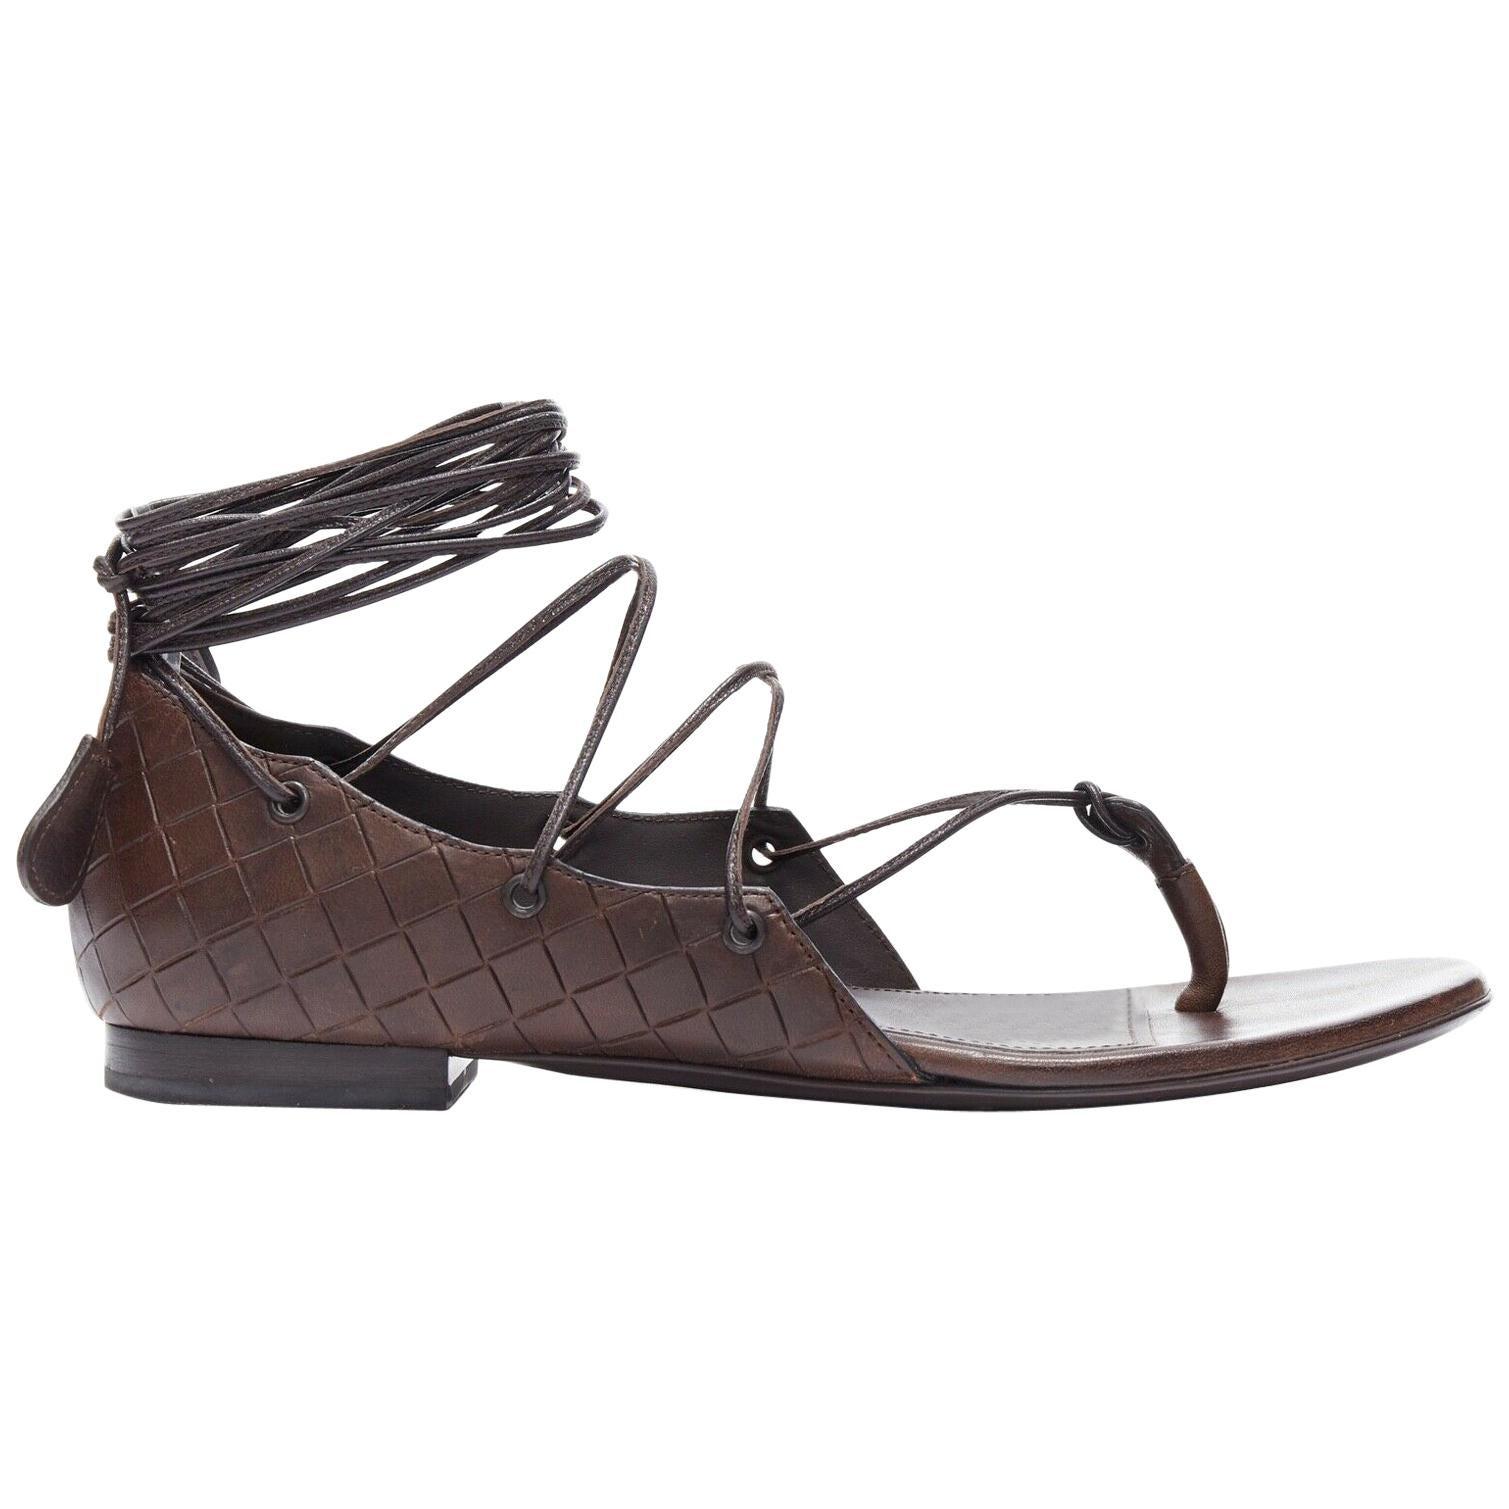 BOTTEGA VENETA brown intrecciato woven leather lace up thong flat sandals EU37